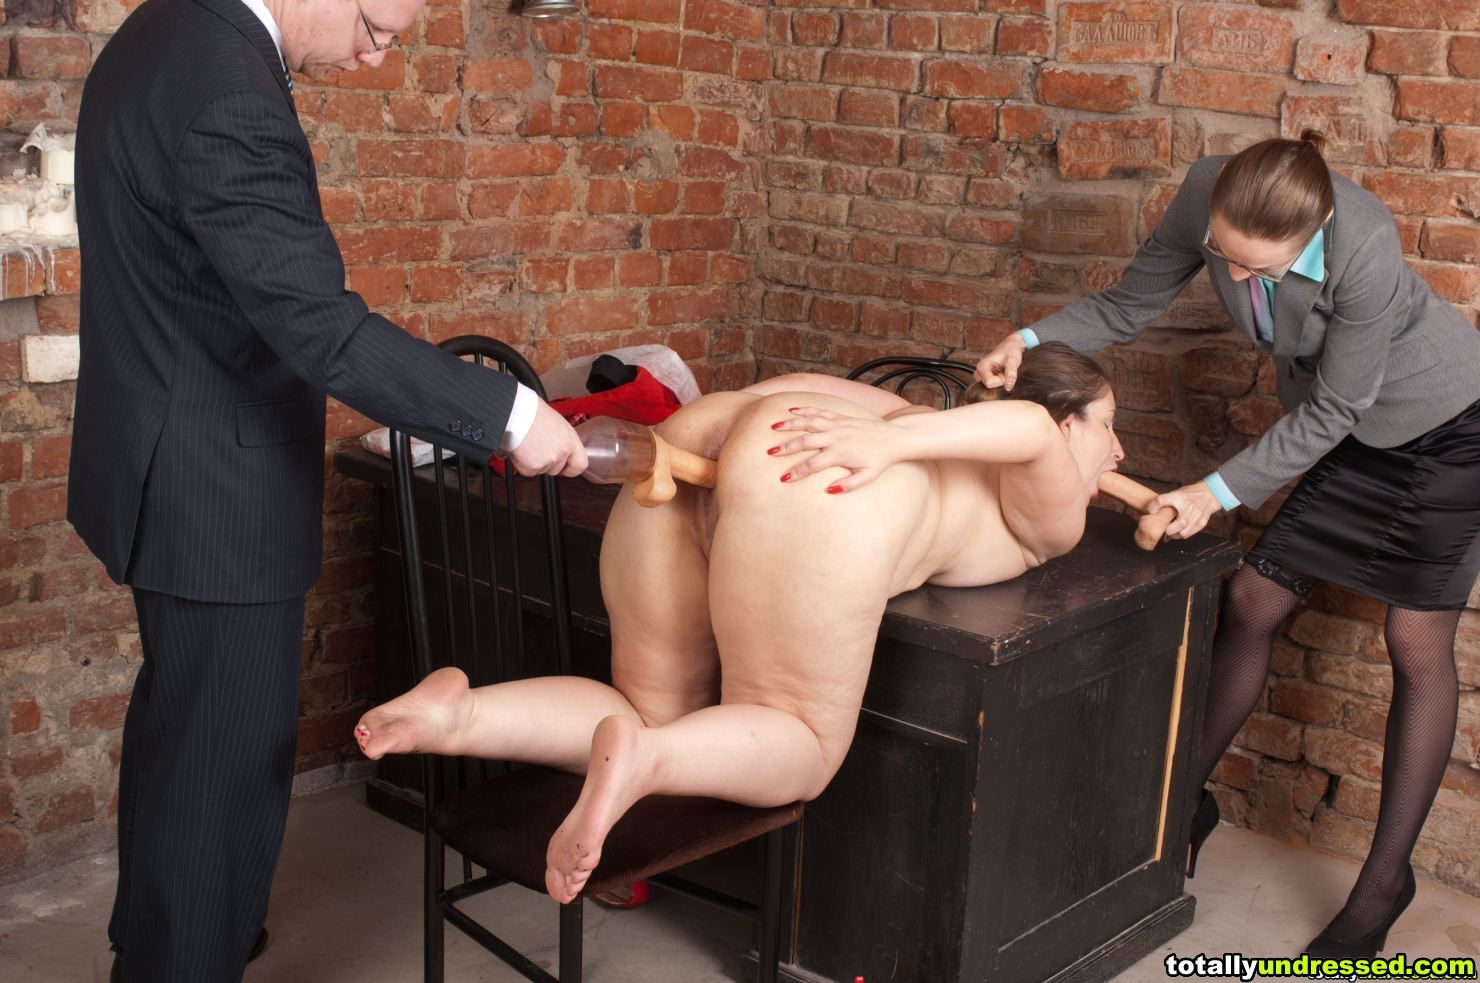 Fat girl humiliated